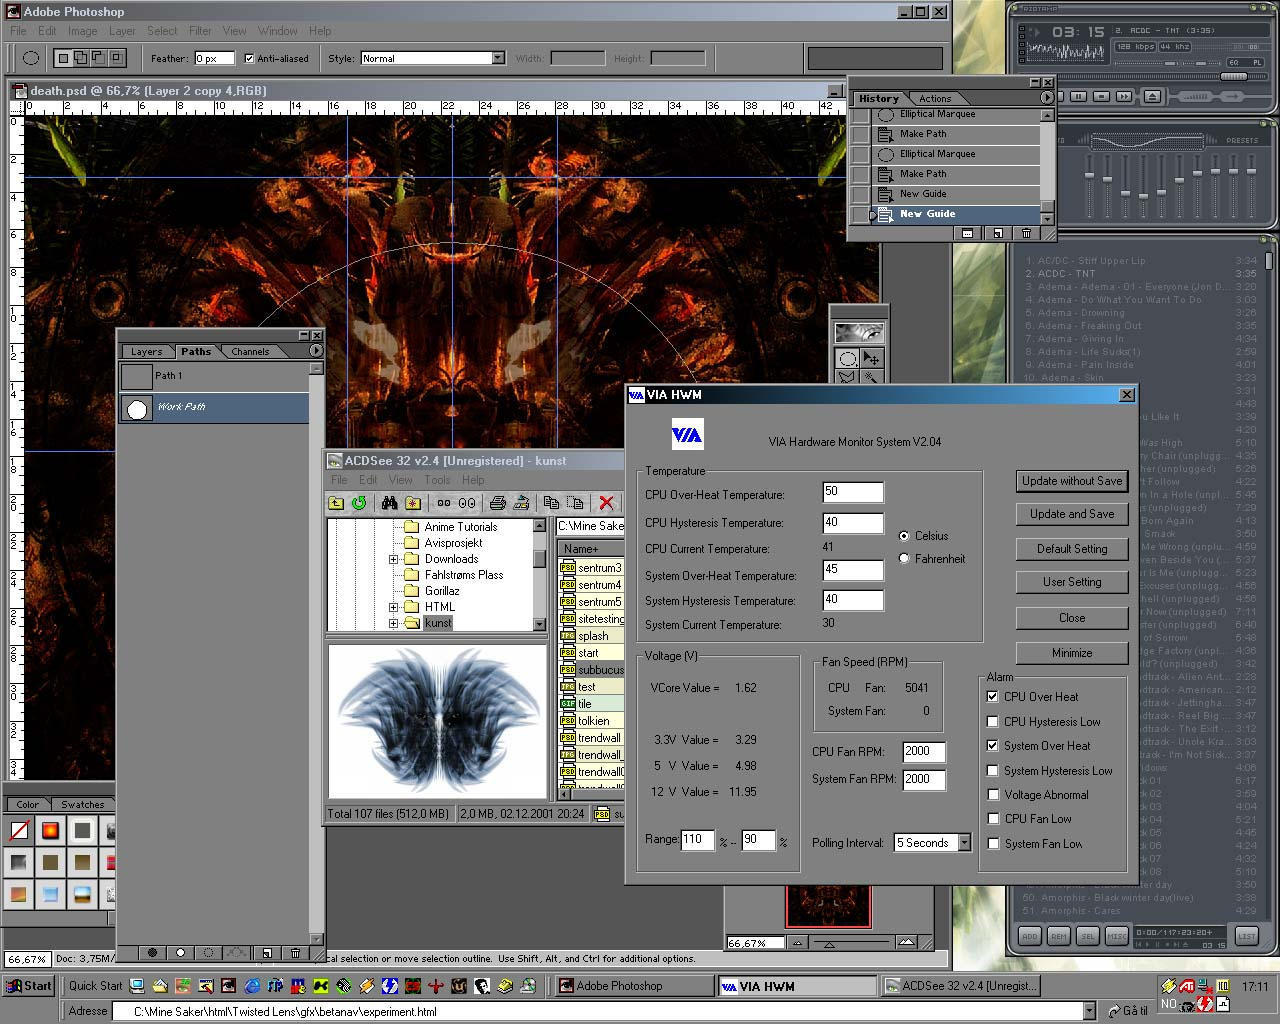 necrons desktop 07 03 02 by necron